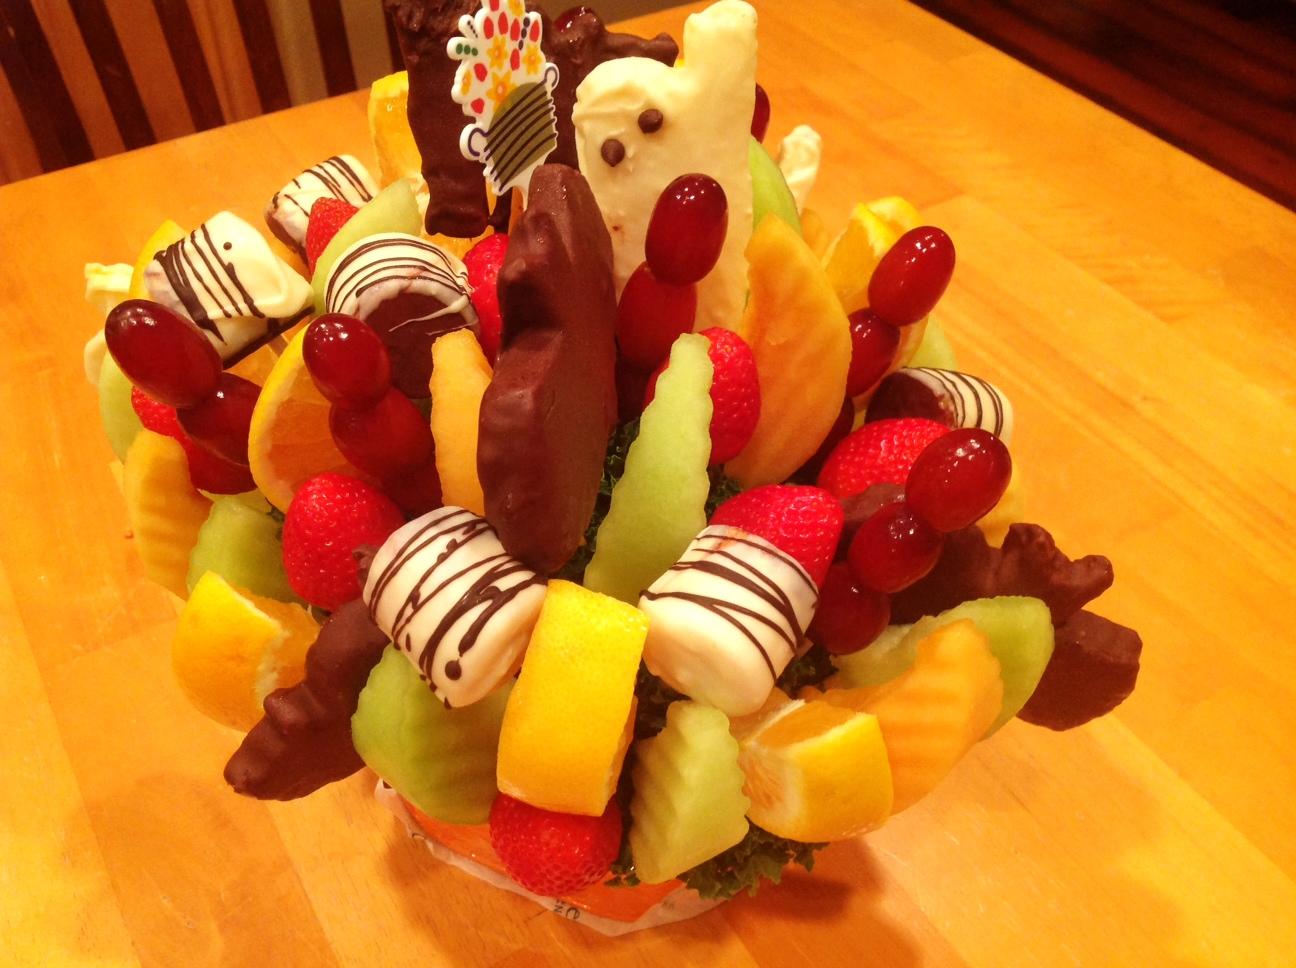 Edible Arrangements-The Perfect Halloween Treat